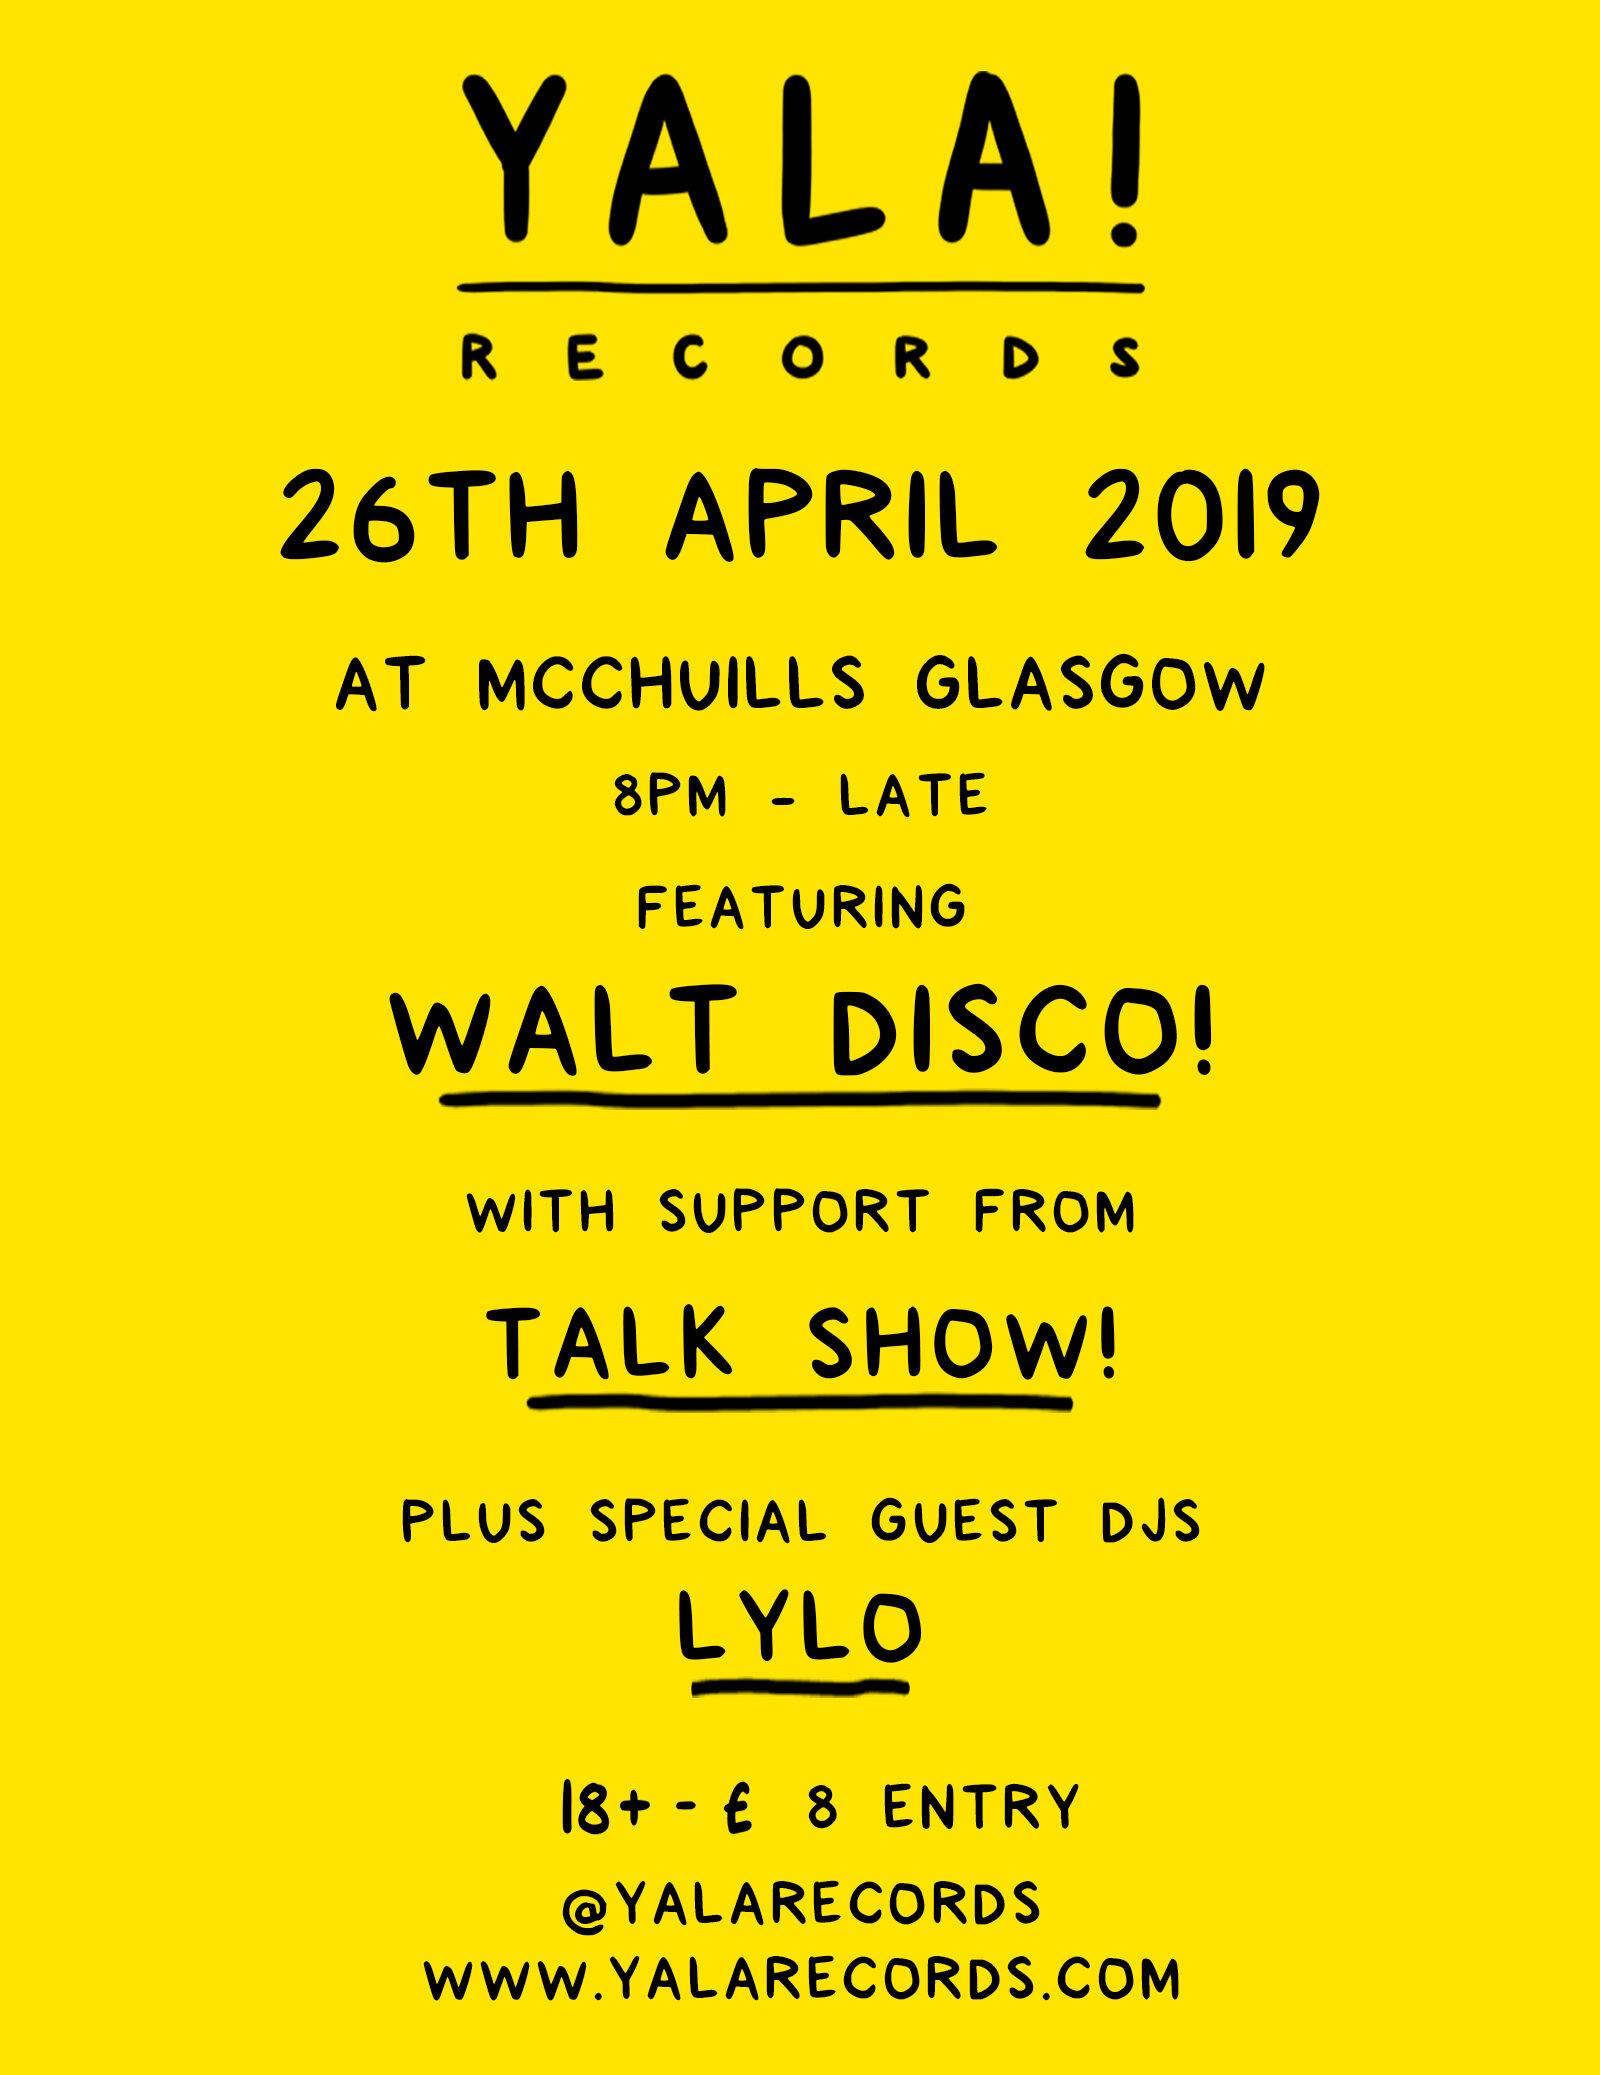 Walk Disco + Talk Show + djs.jpg